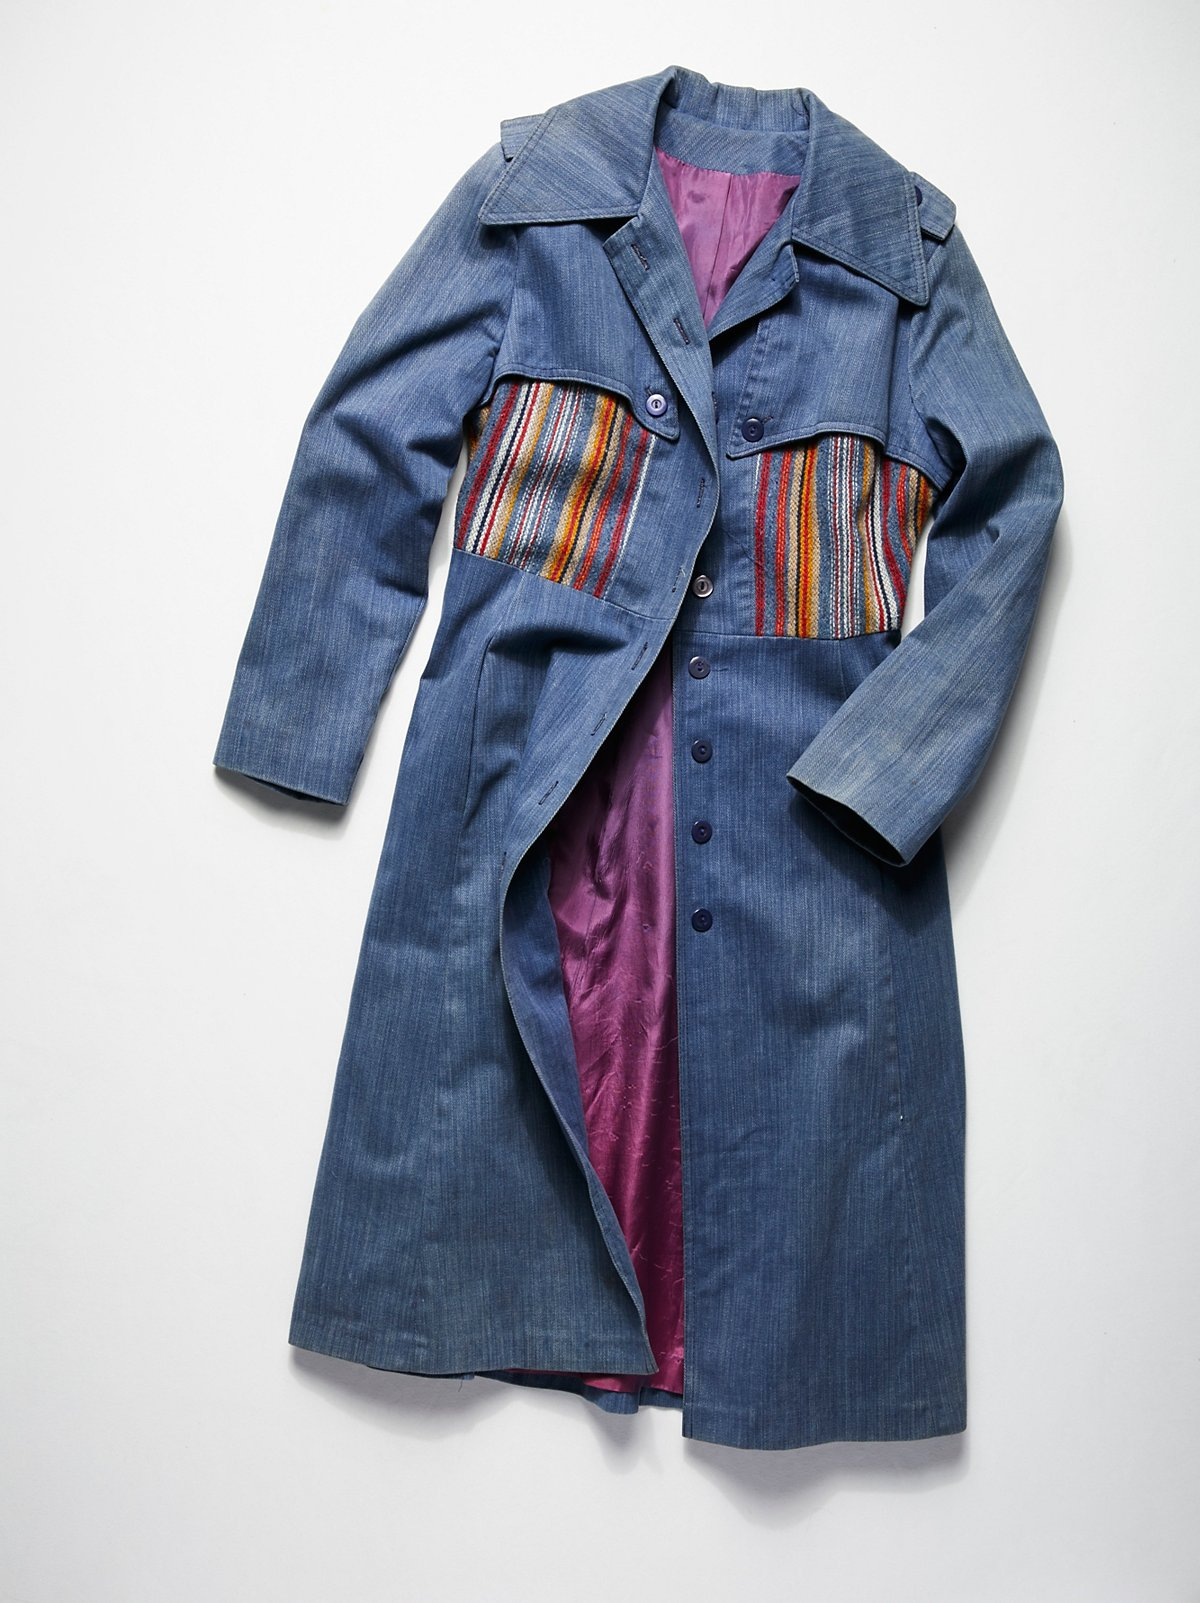 Vintage 1970s Denim Duster Coat